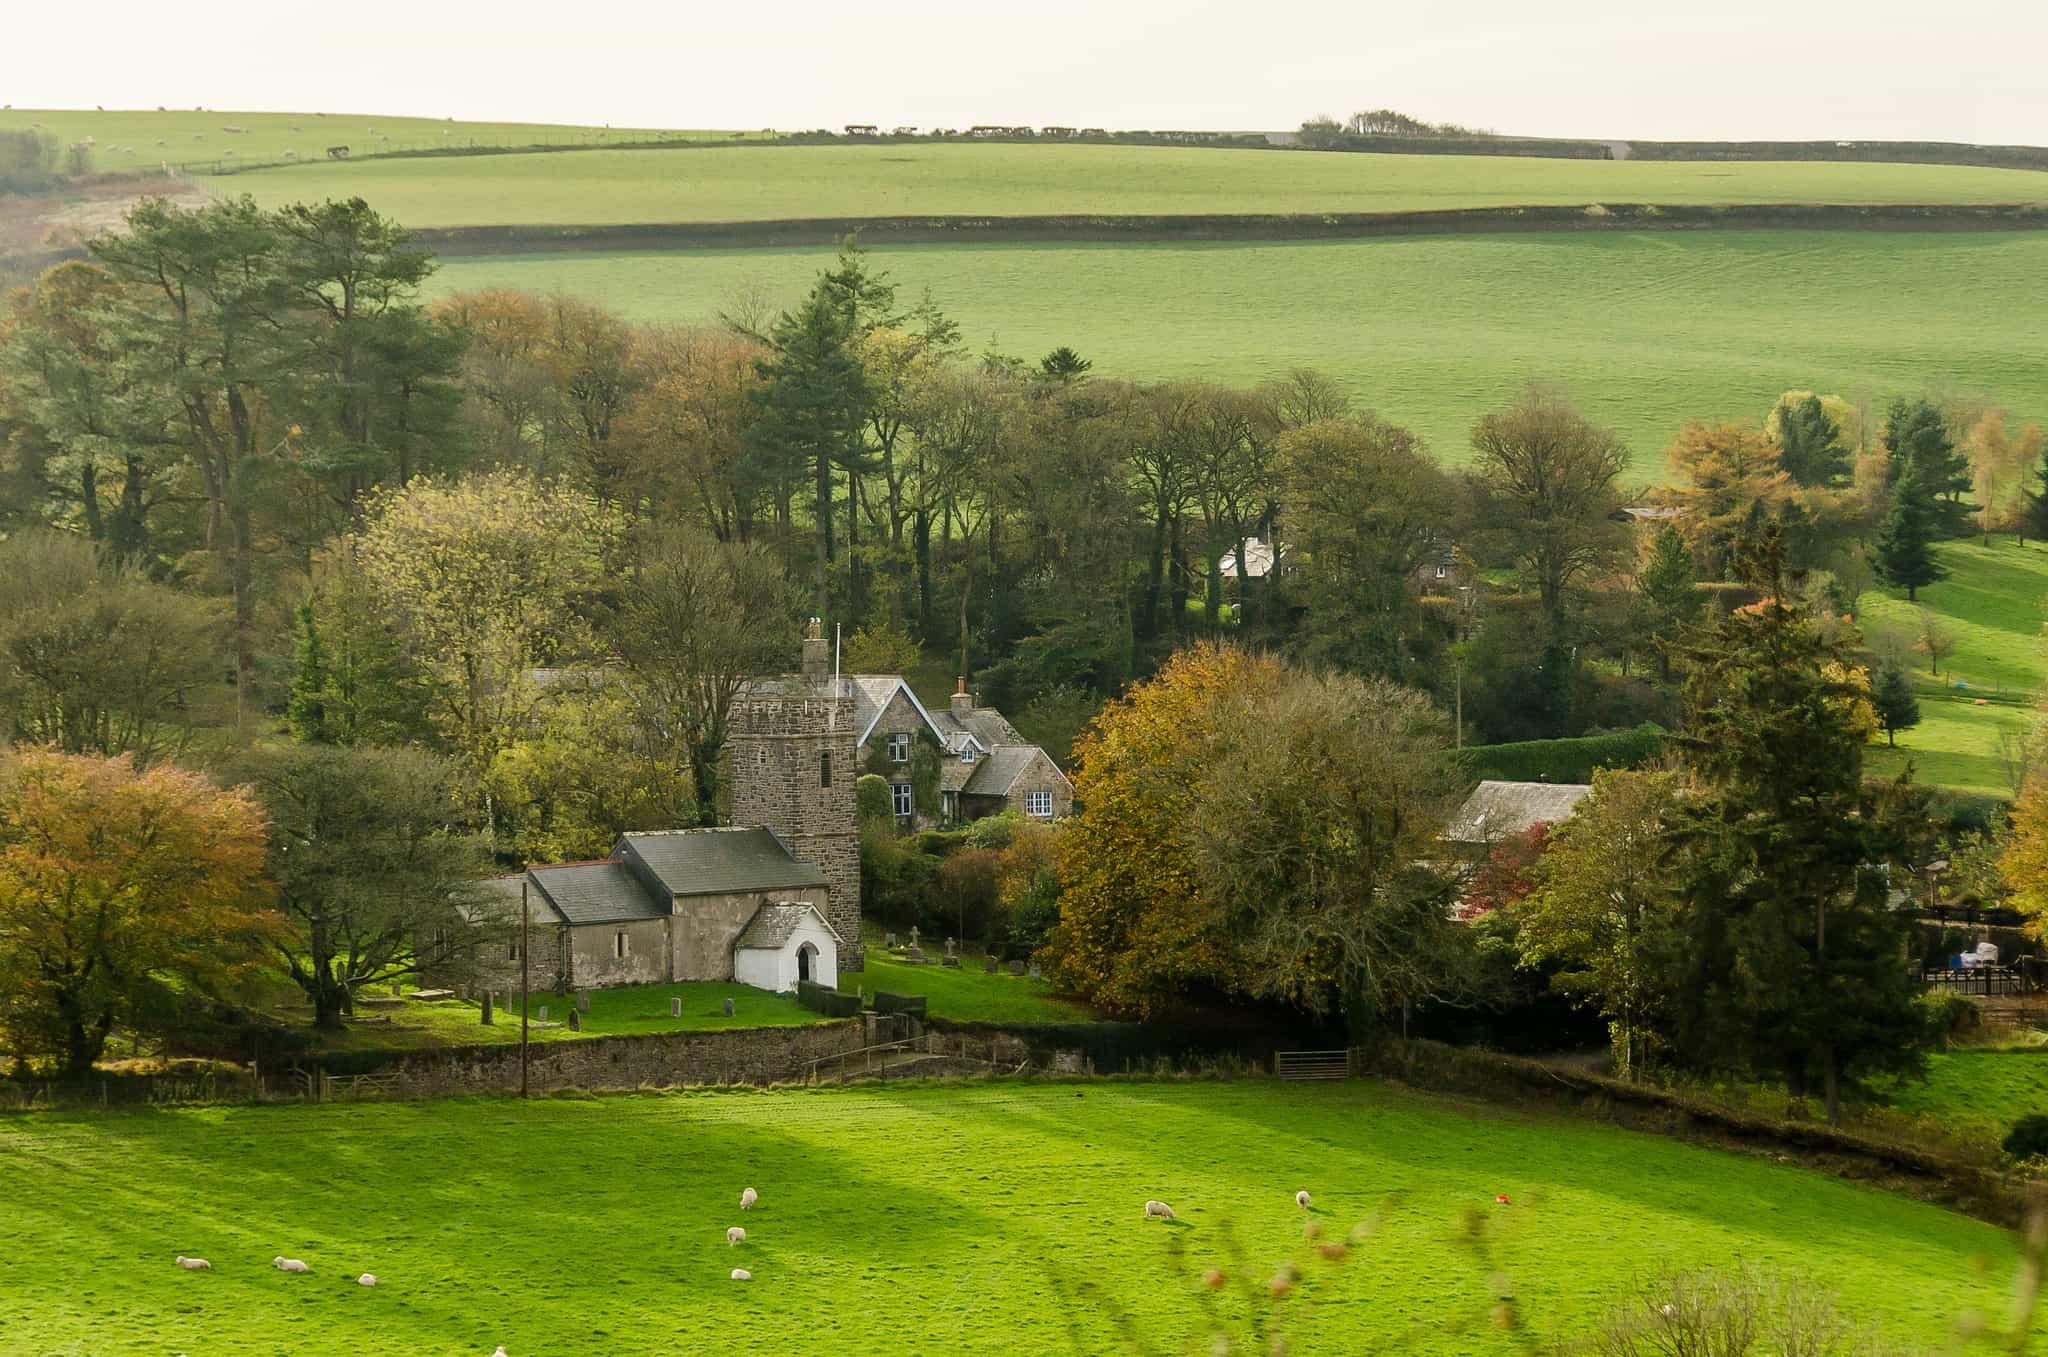 Walking Through Villages in Exmoor